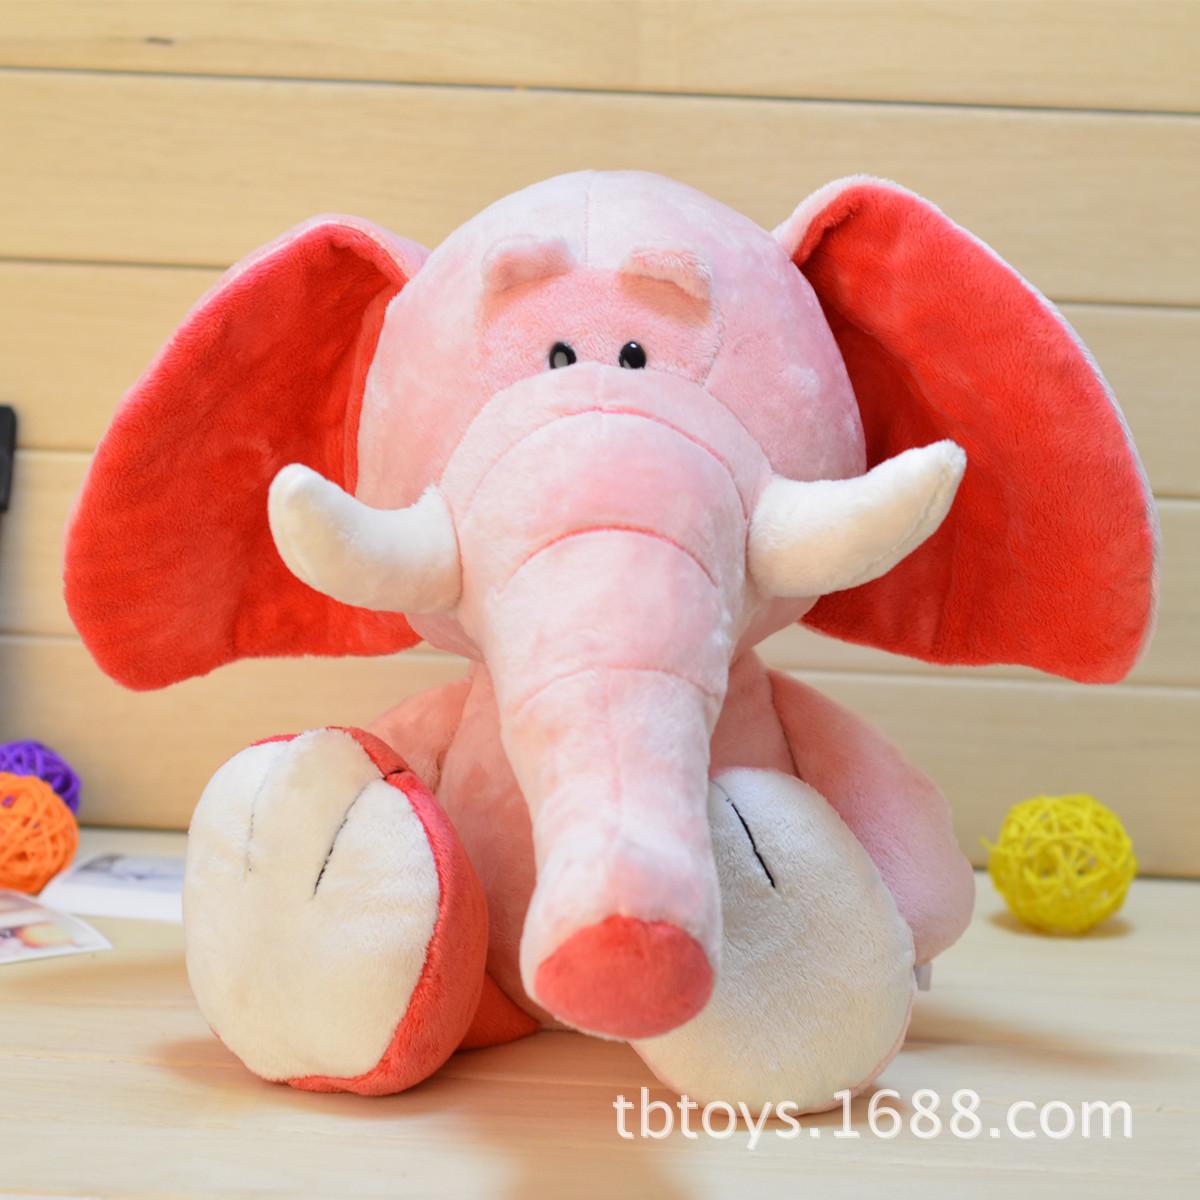 Mainan Boneka Plush Gajah Pink Seri Poker Untuk Hadiah Shopee Indonesia